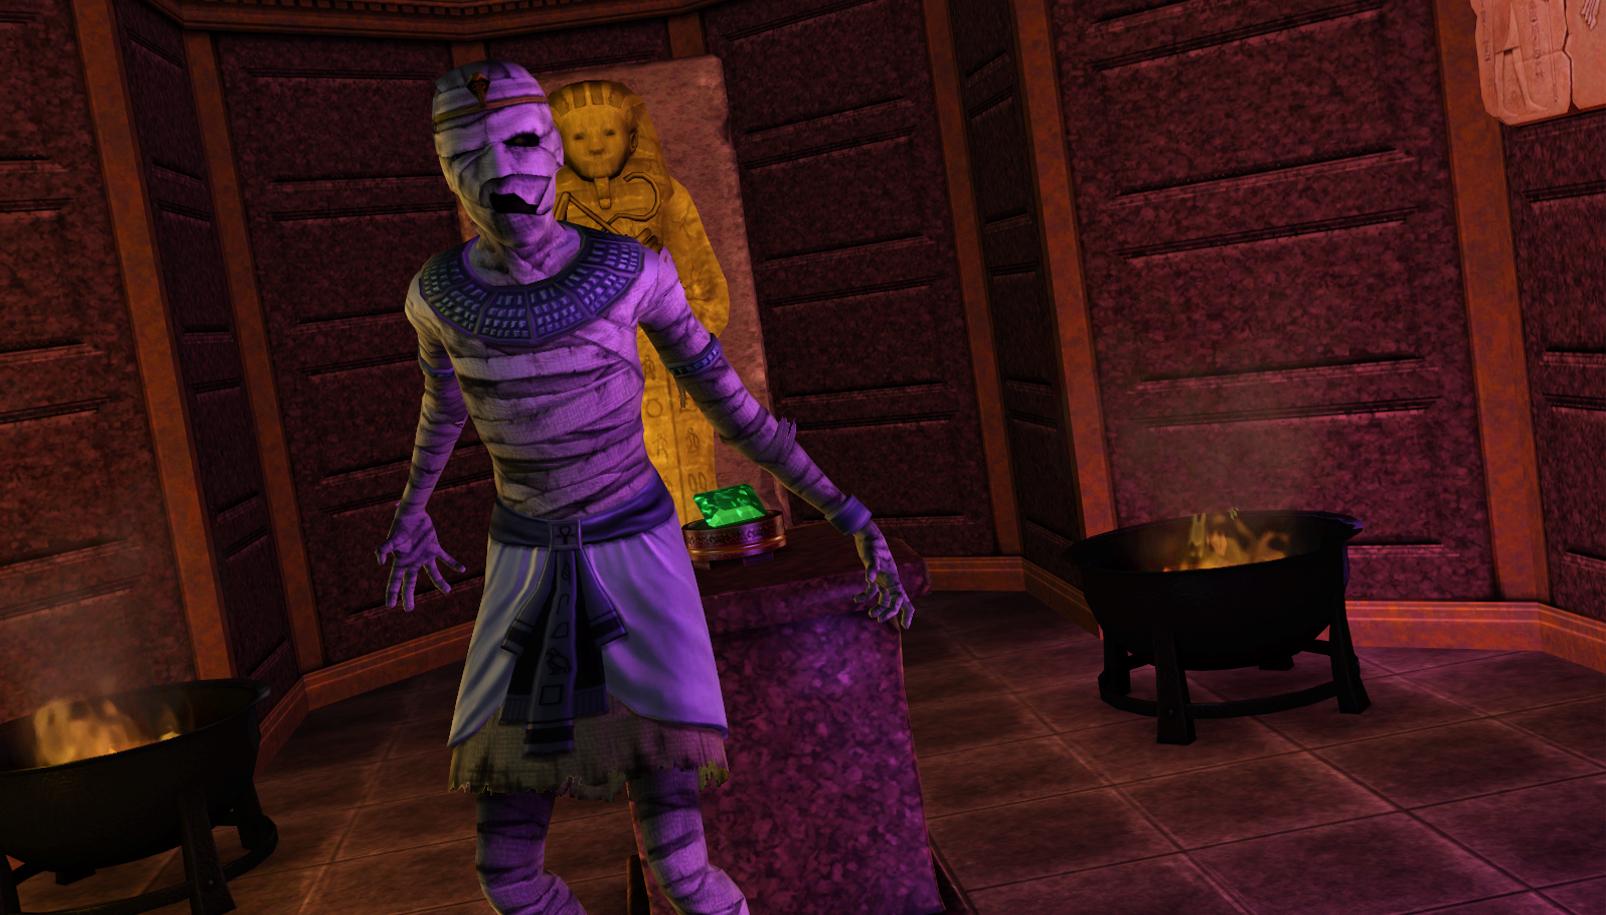 Les Sims 3: Destination Aventure (Win - Mac) - Image 7